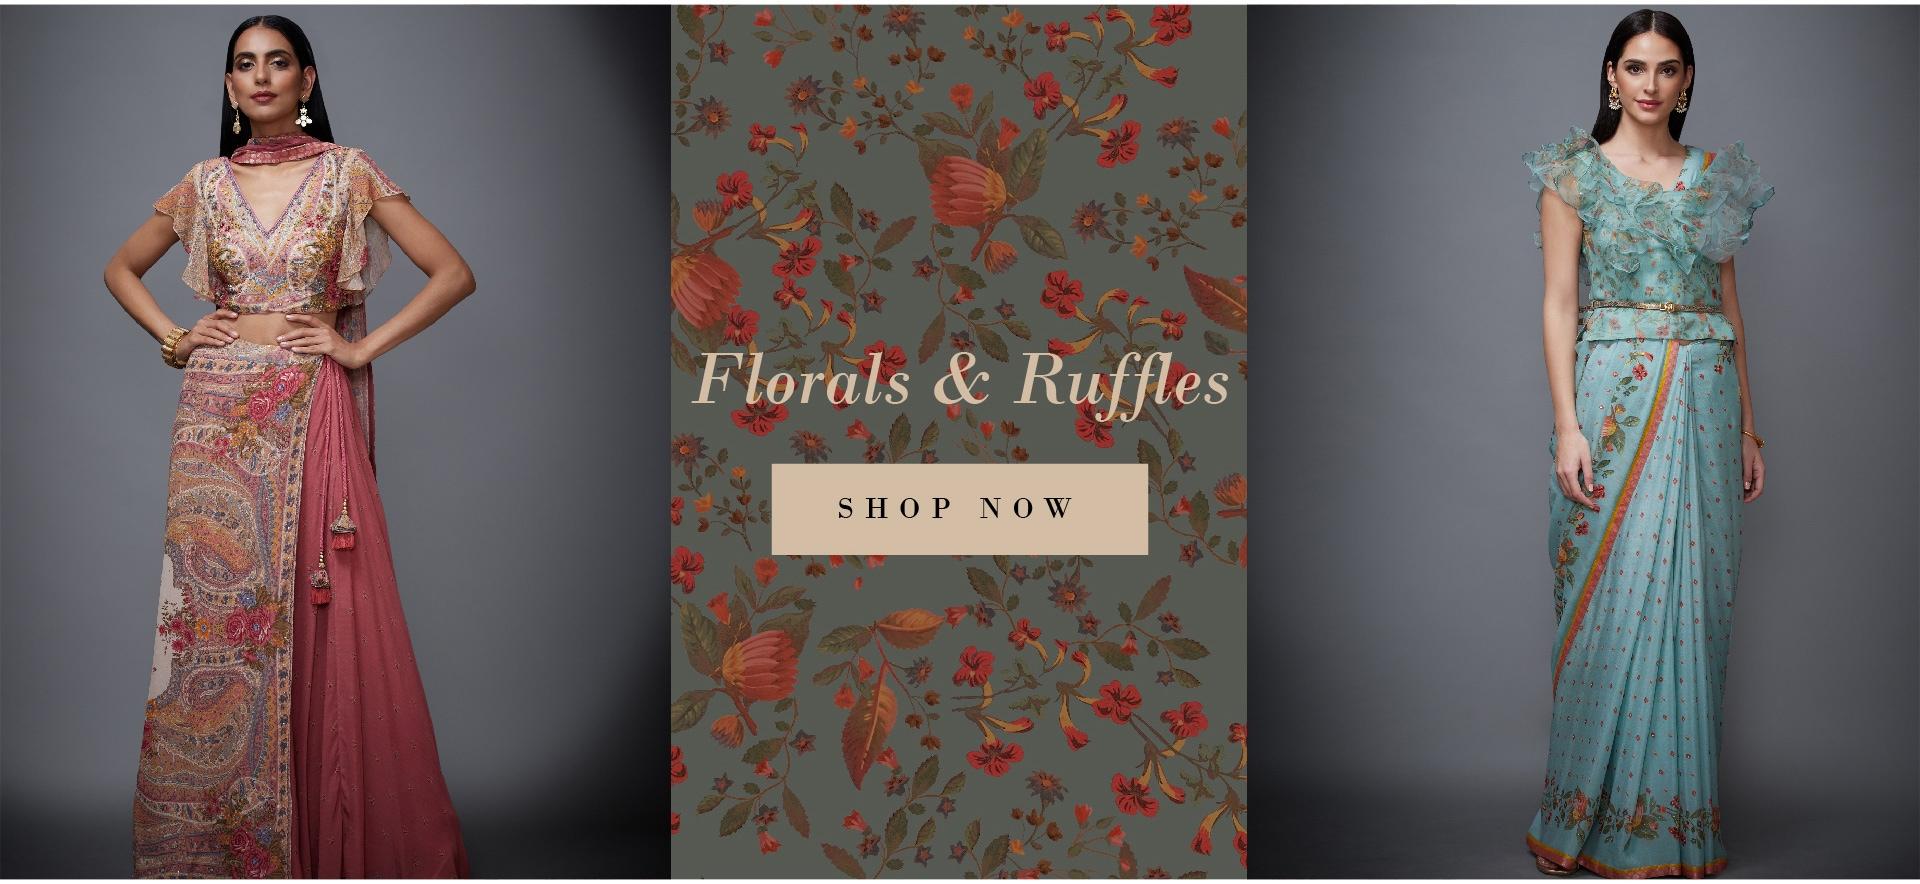 Ruffles & Florals